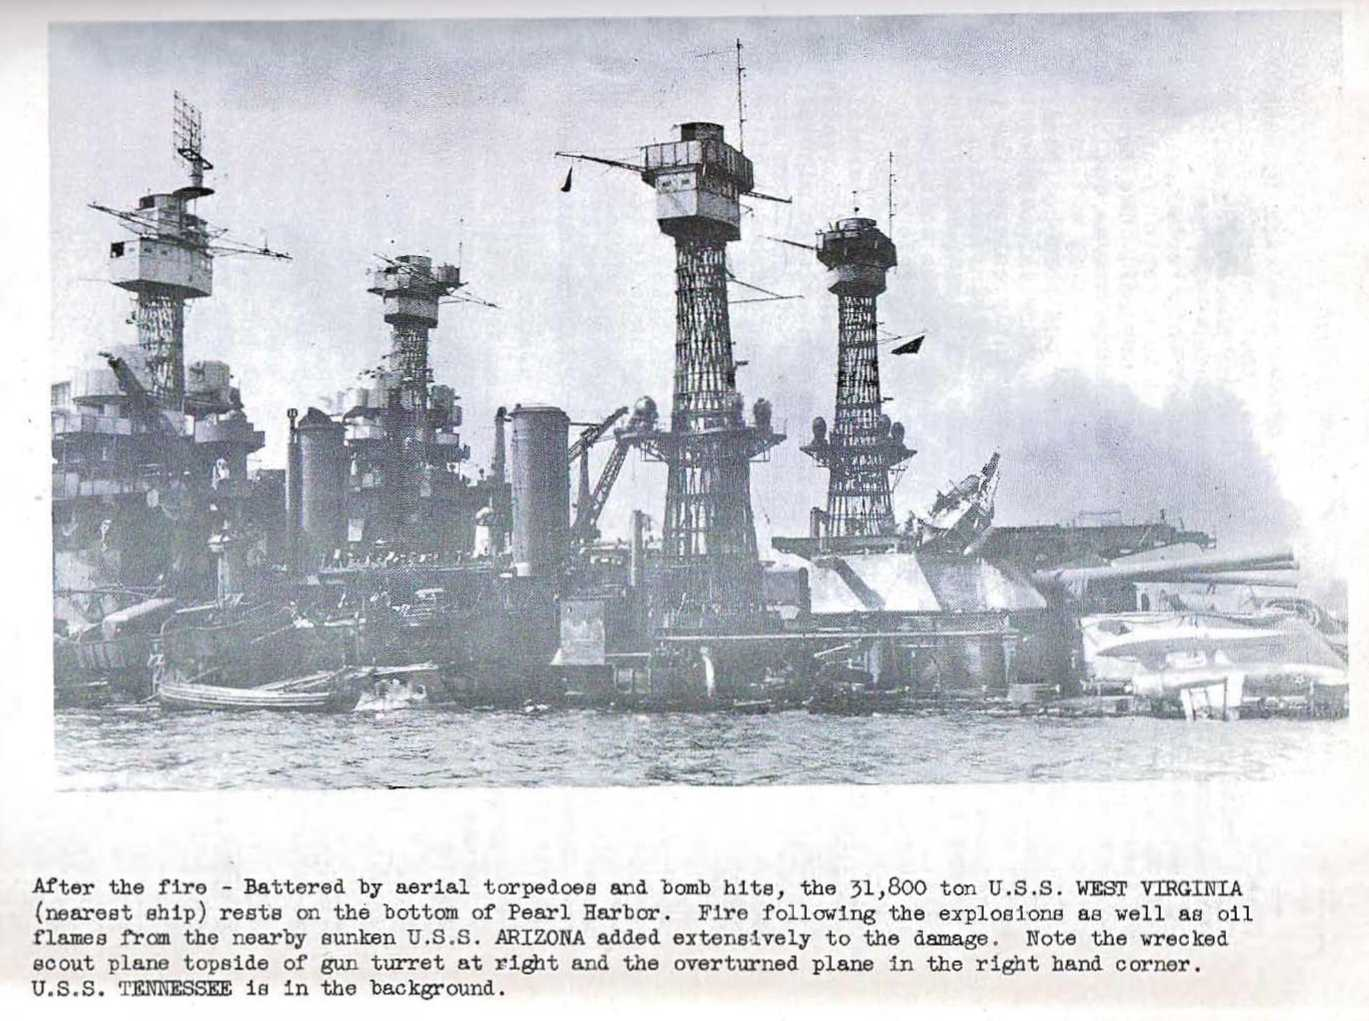 Ship's 100% Original To Win A High Admiration Vintage Naval Signal Flag – Boat Ecuador 412